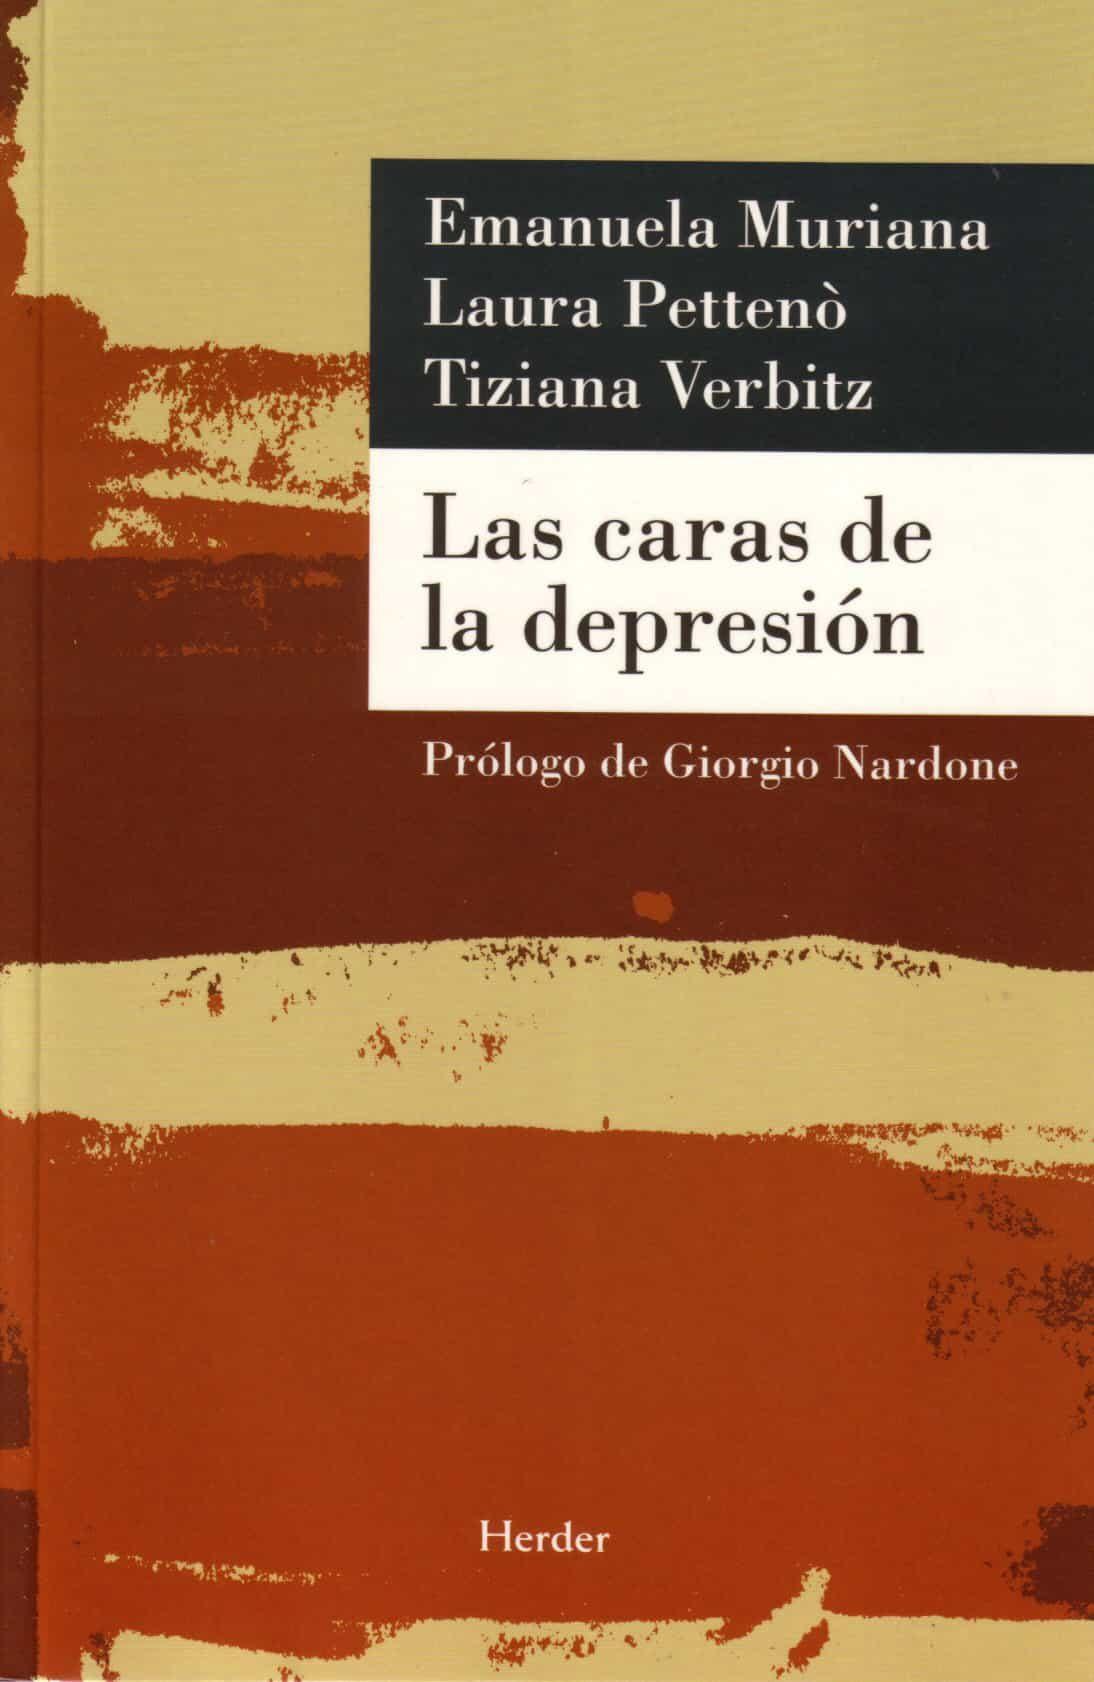 Las Caras De La Depresion por Tiziana Verbitz;                                                                                    Laura Petteno;                                                                                    Emanuela Muriana epub